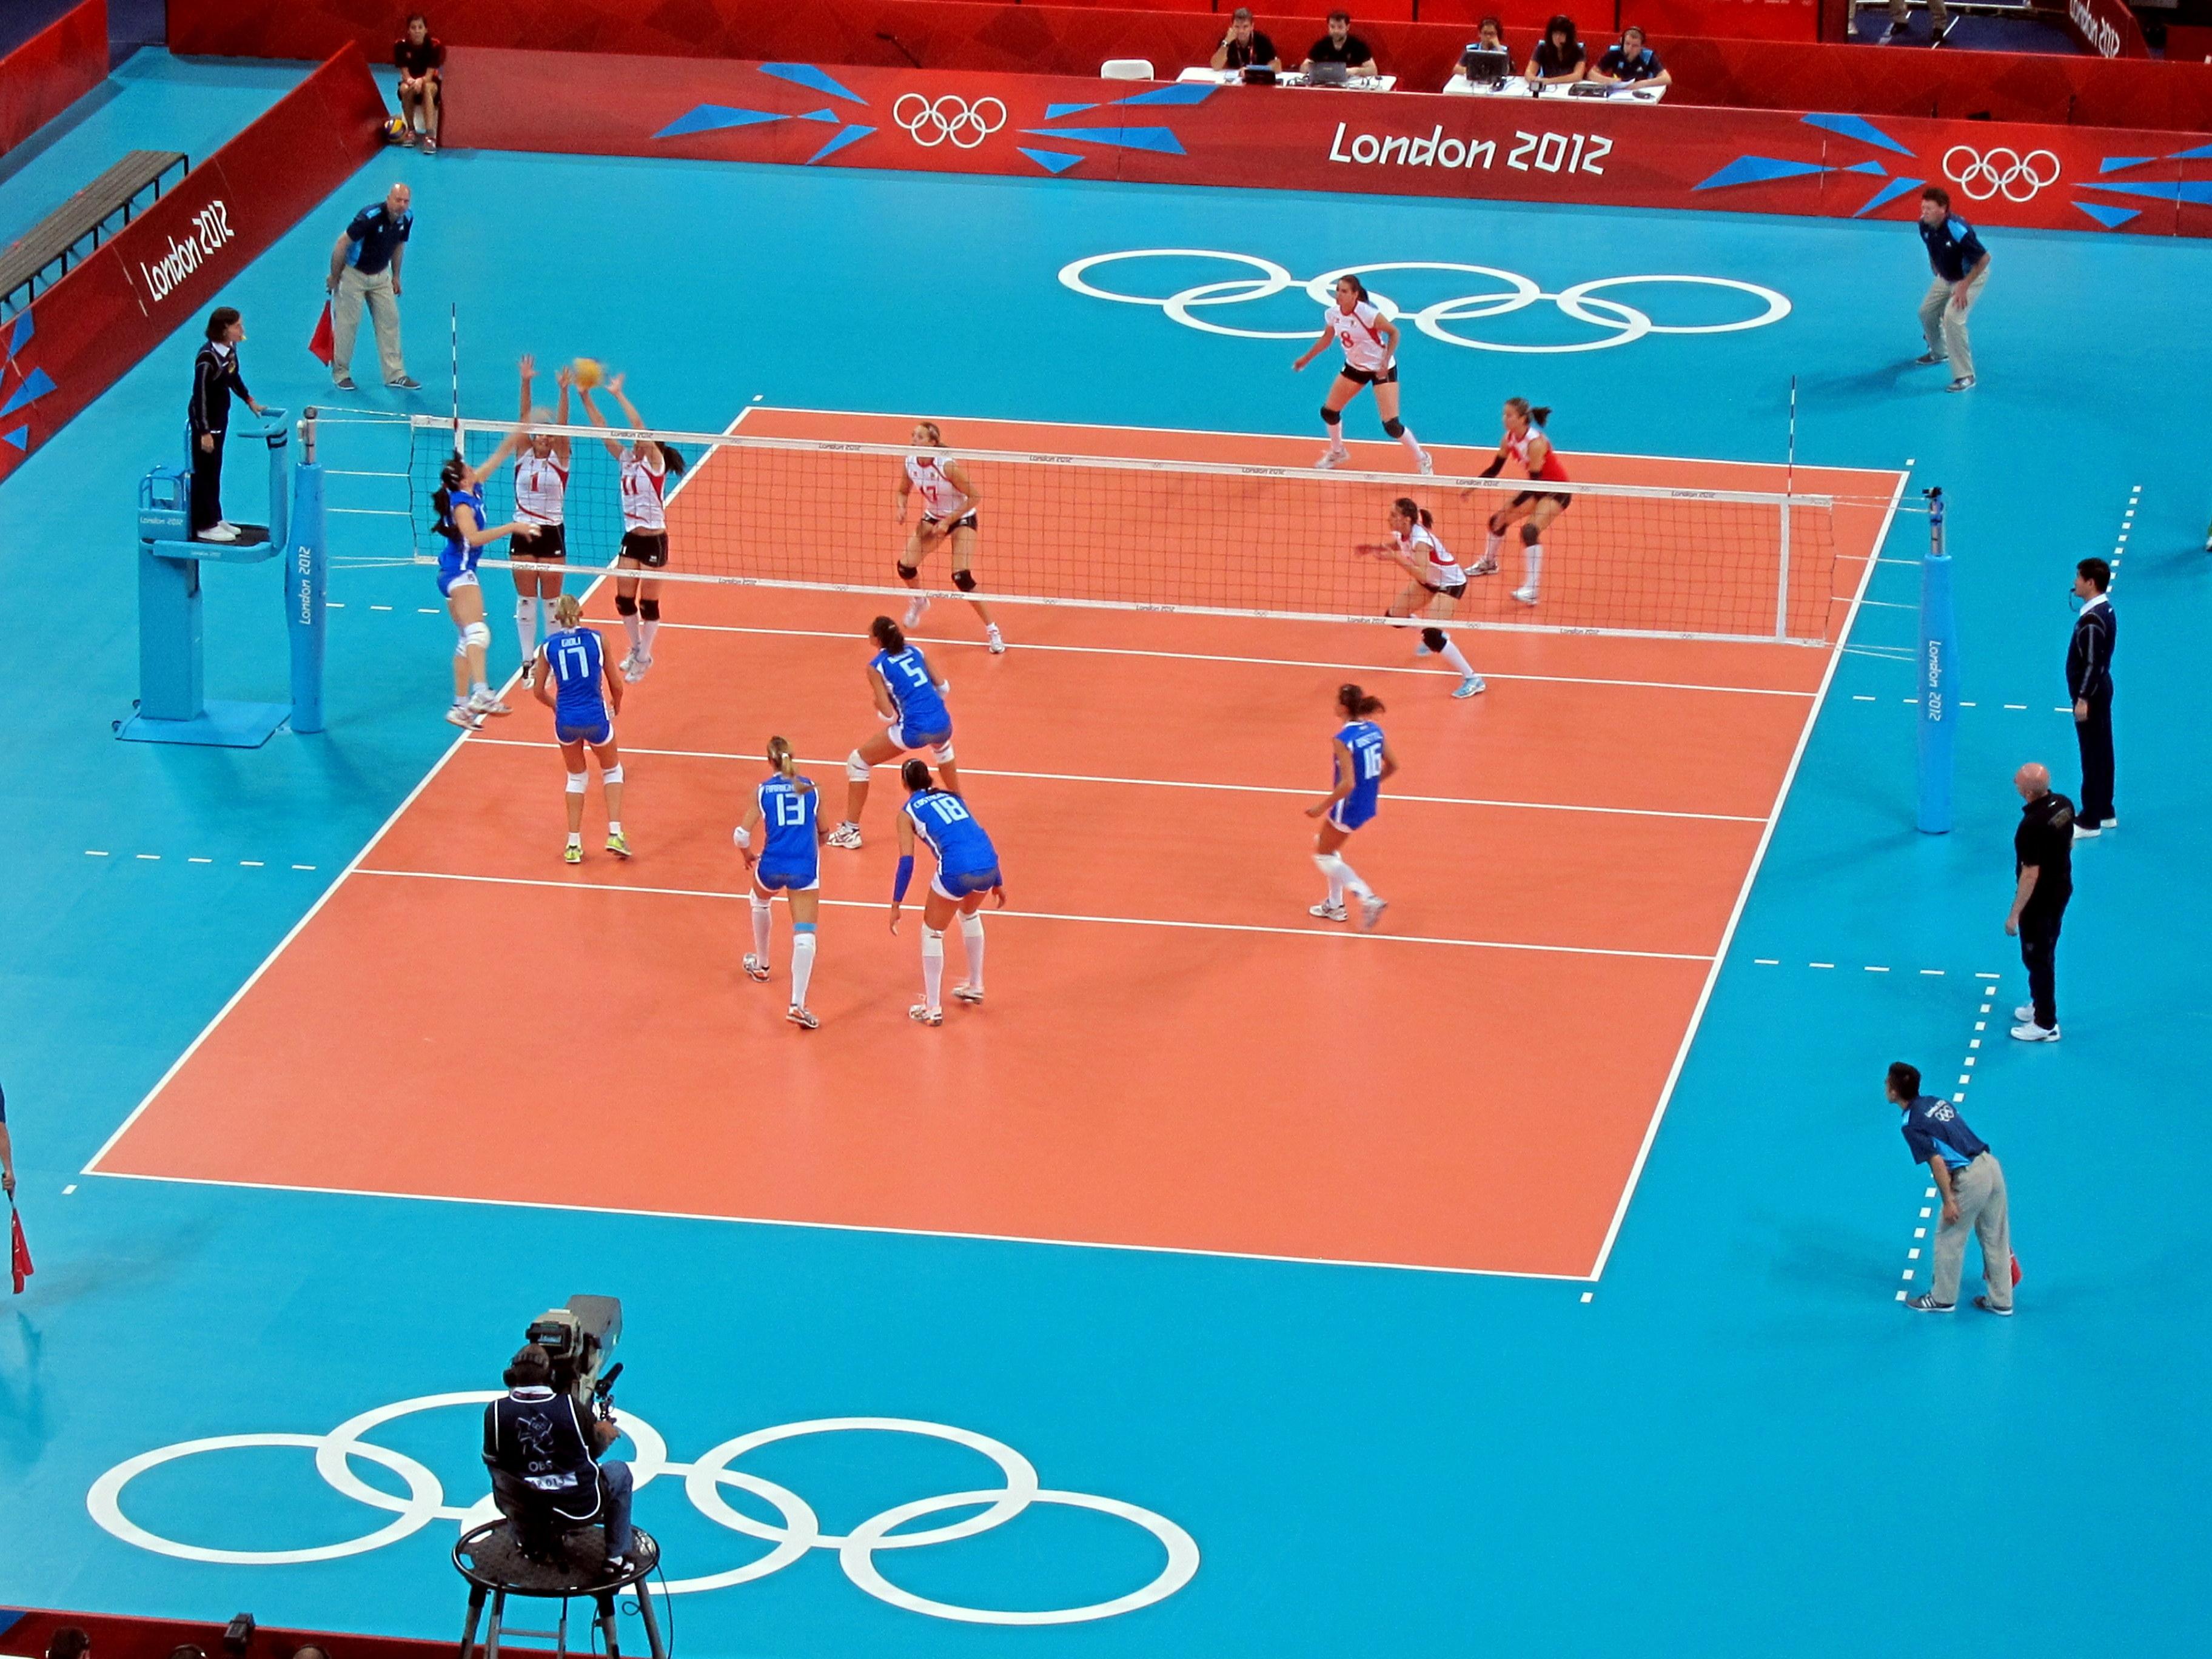 2021 Volleyball Olympics betting